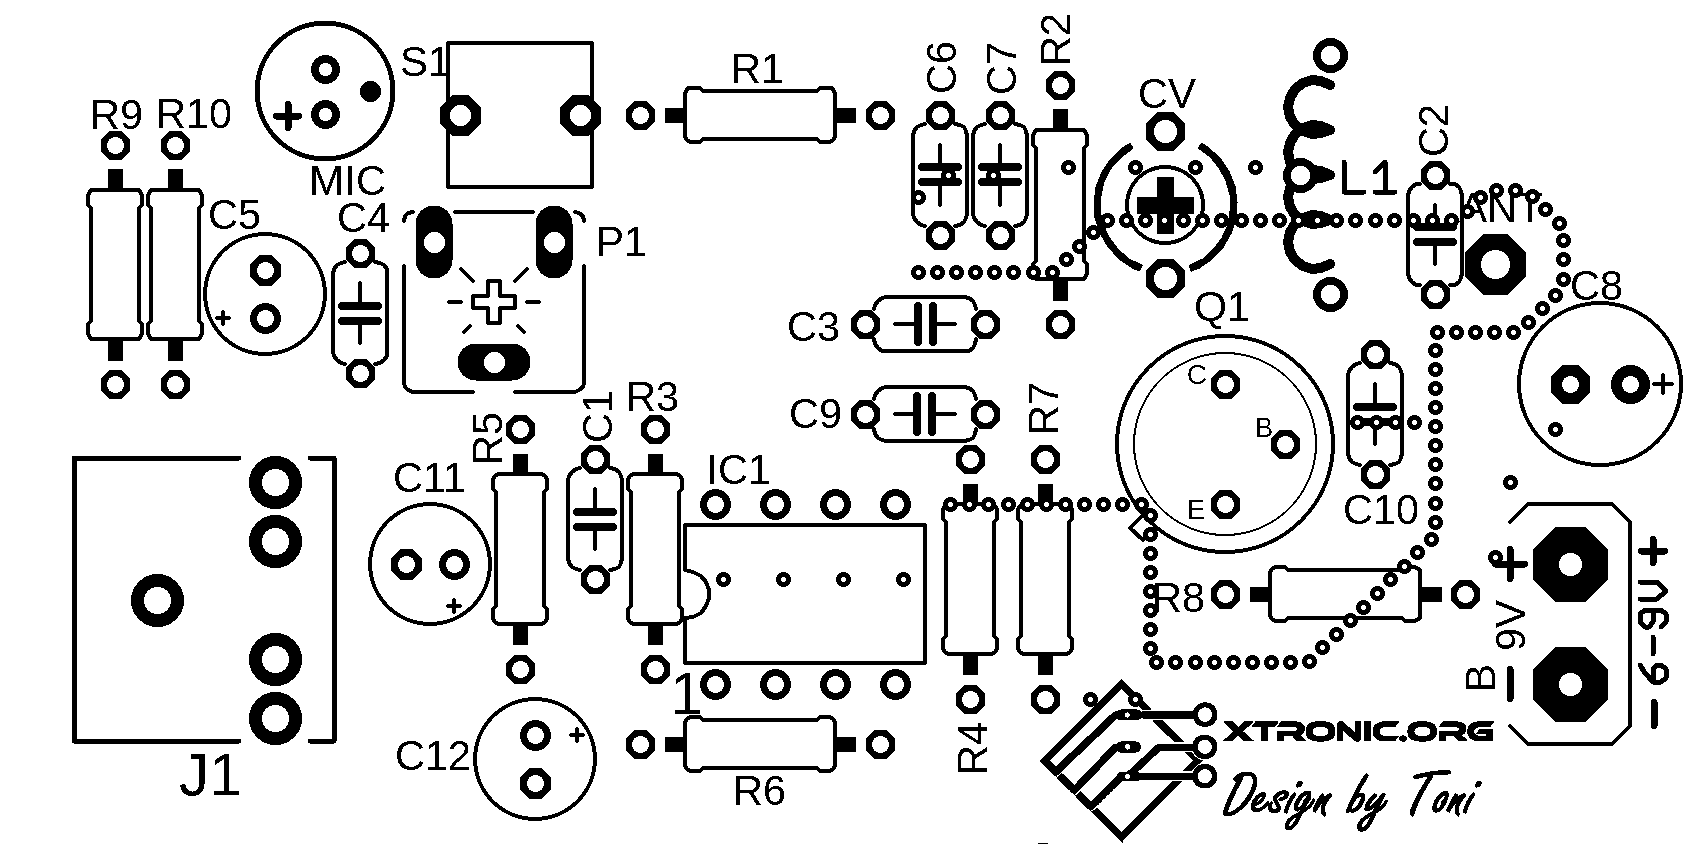 Microphone Jack Schematic